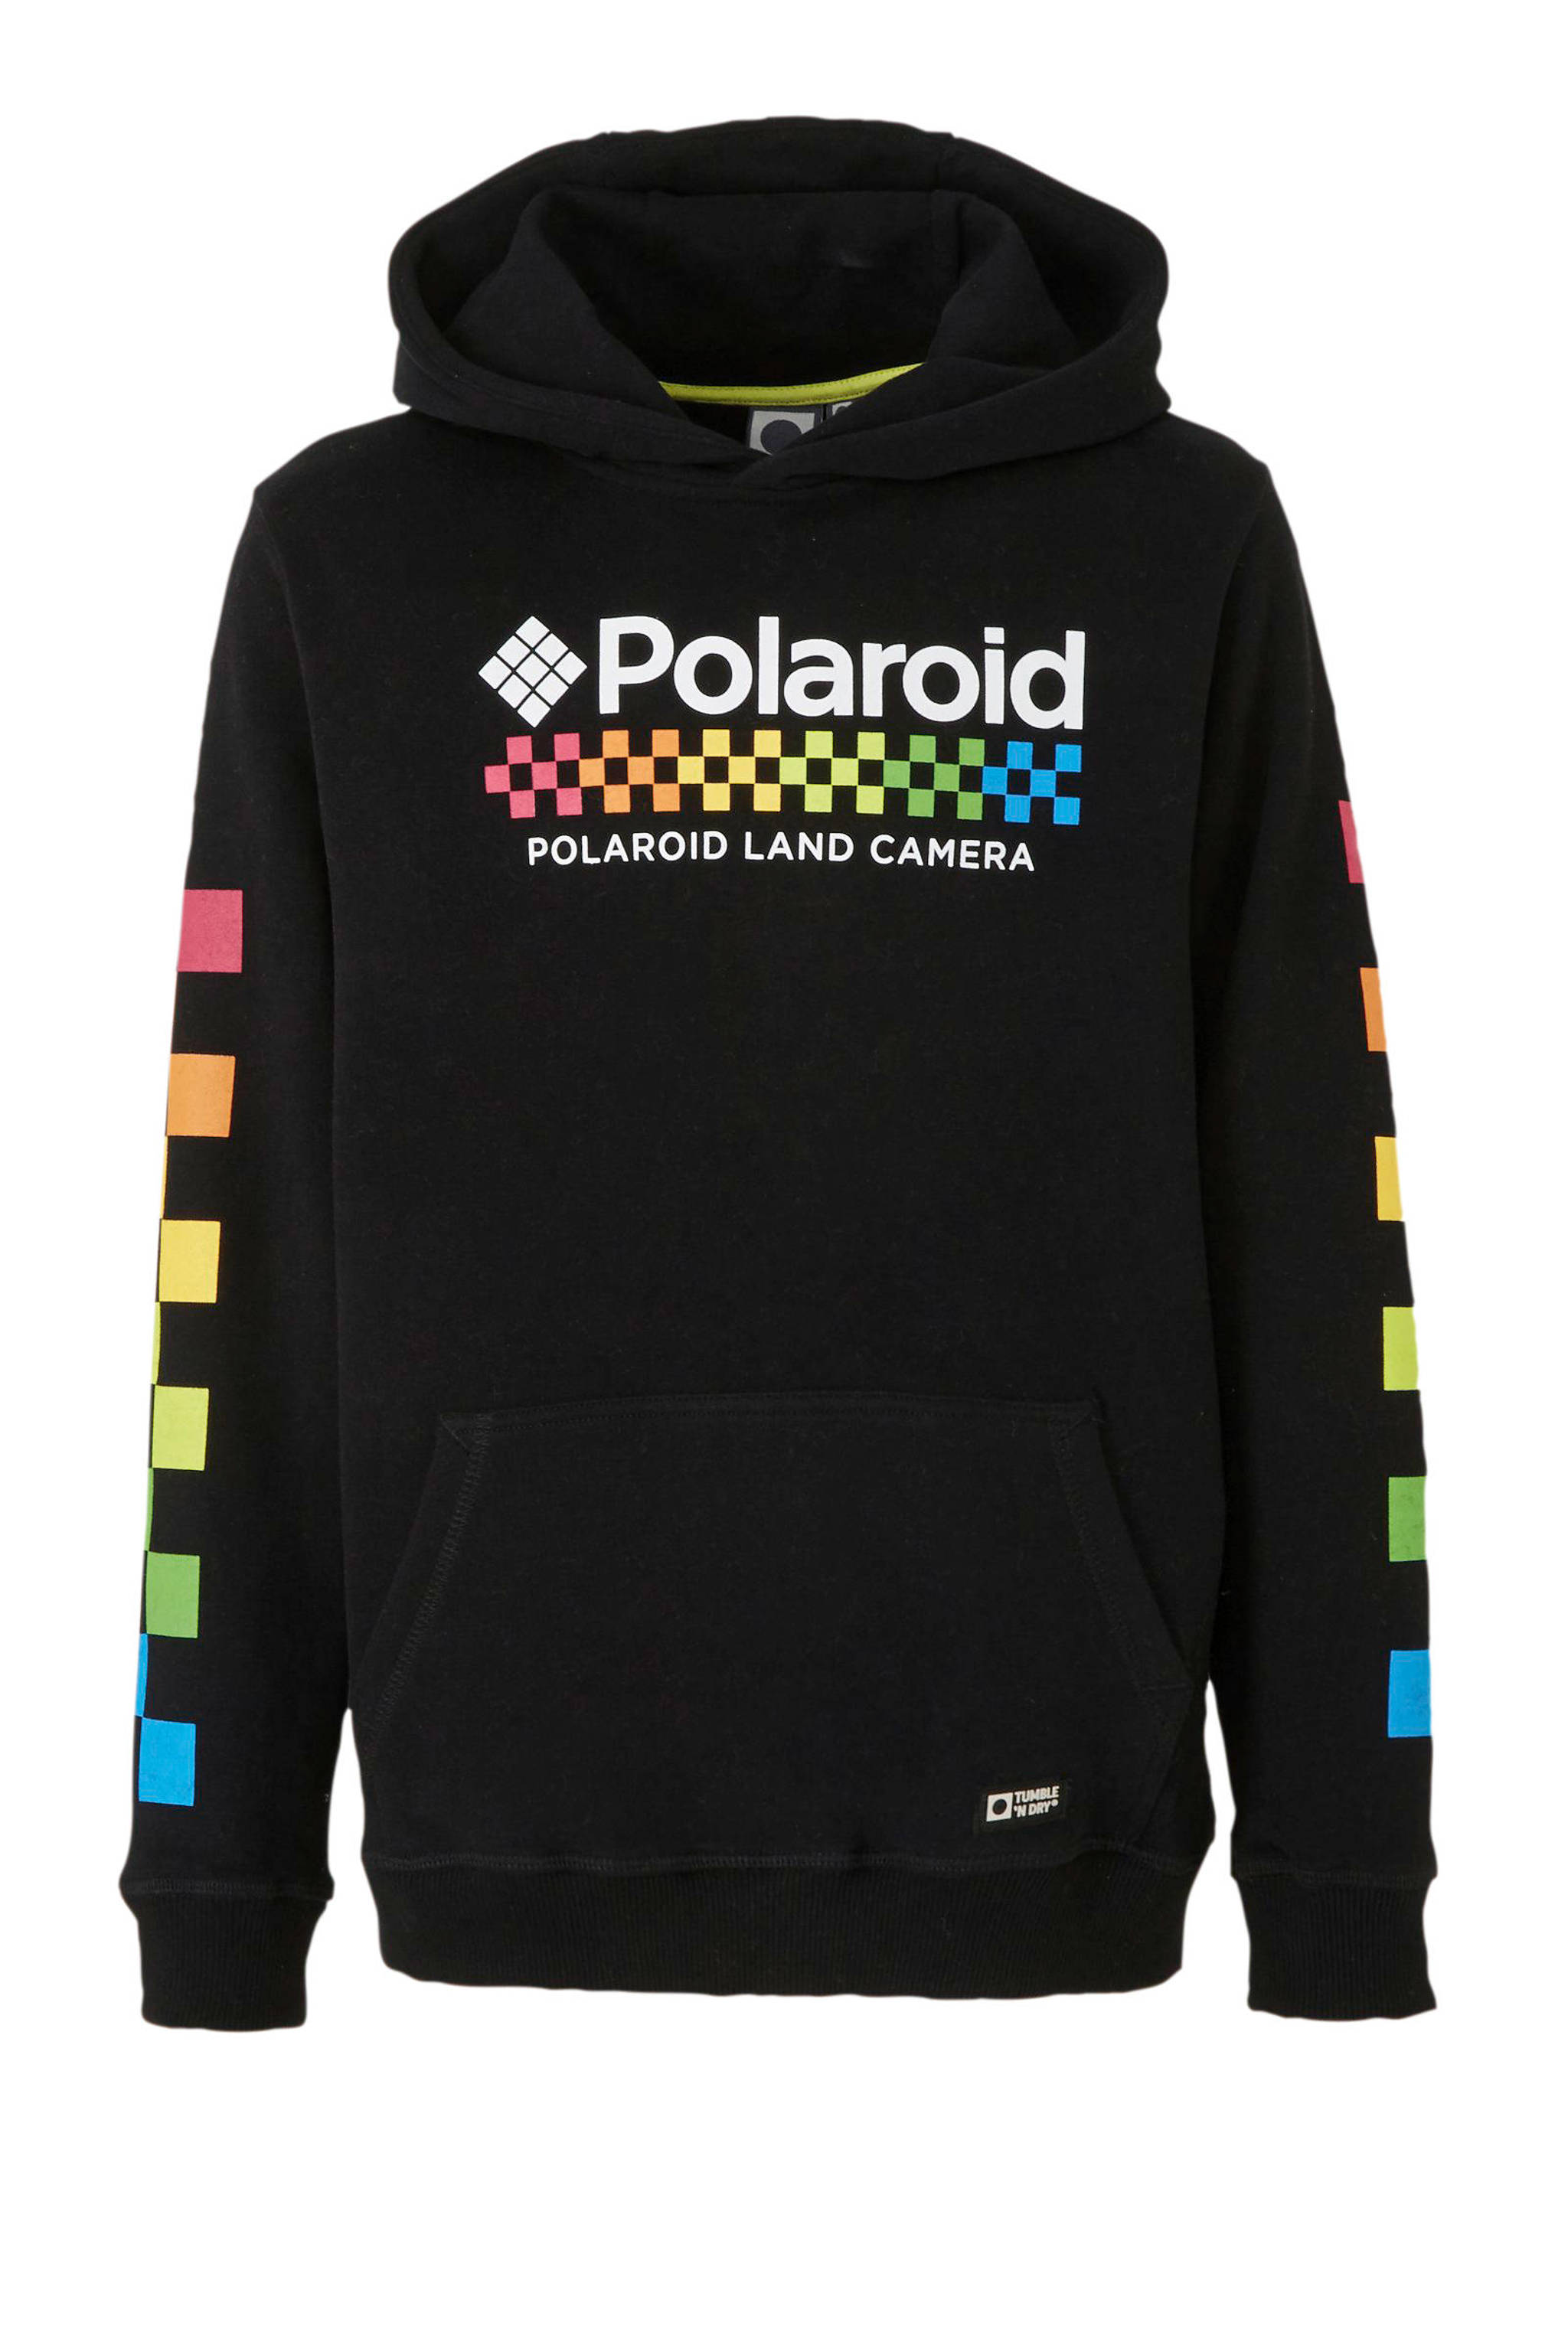 Polaroid sweater Tumble 'N Dry